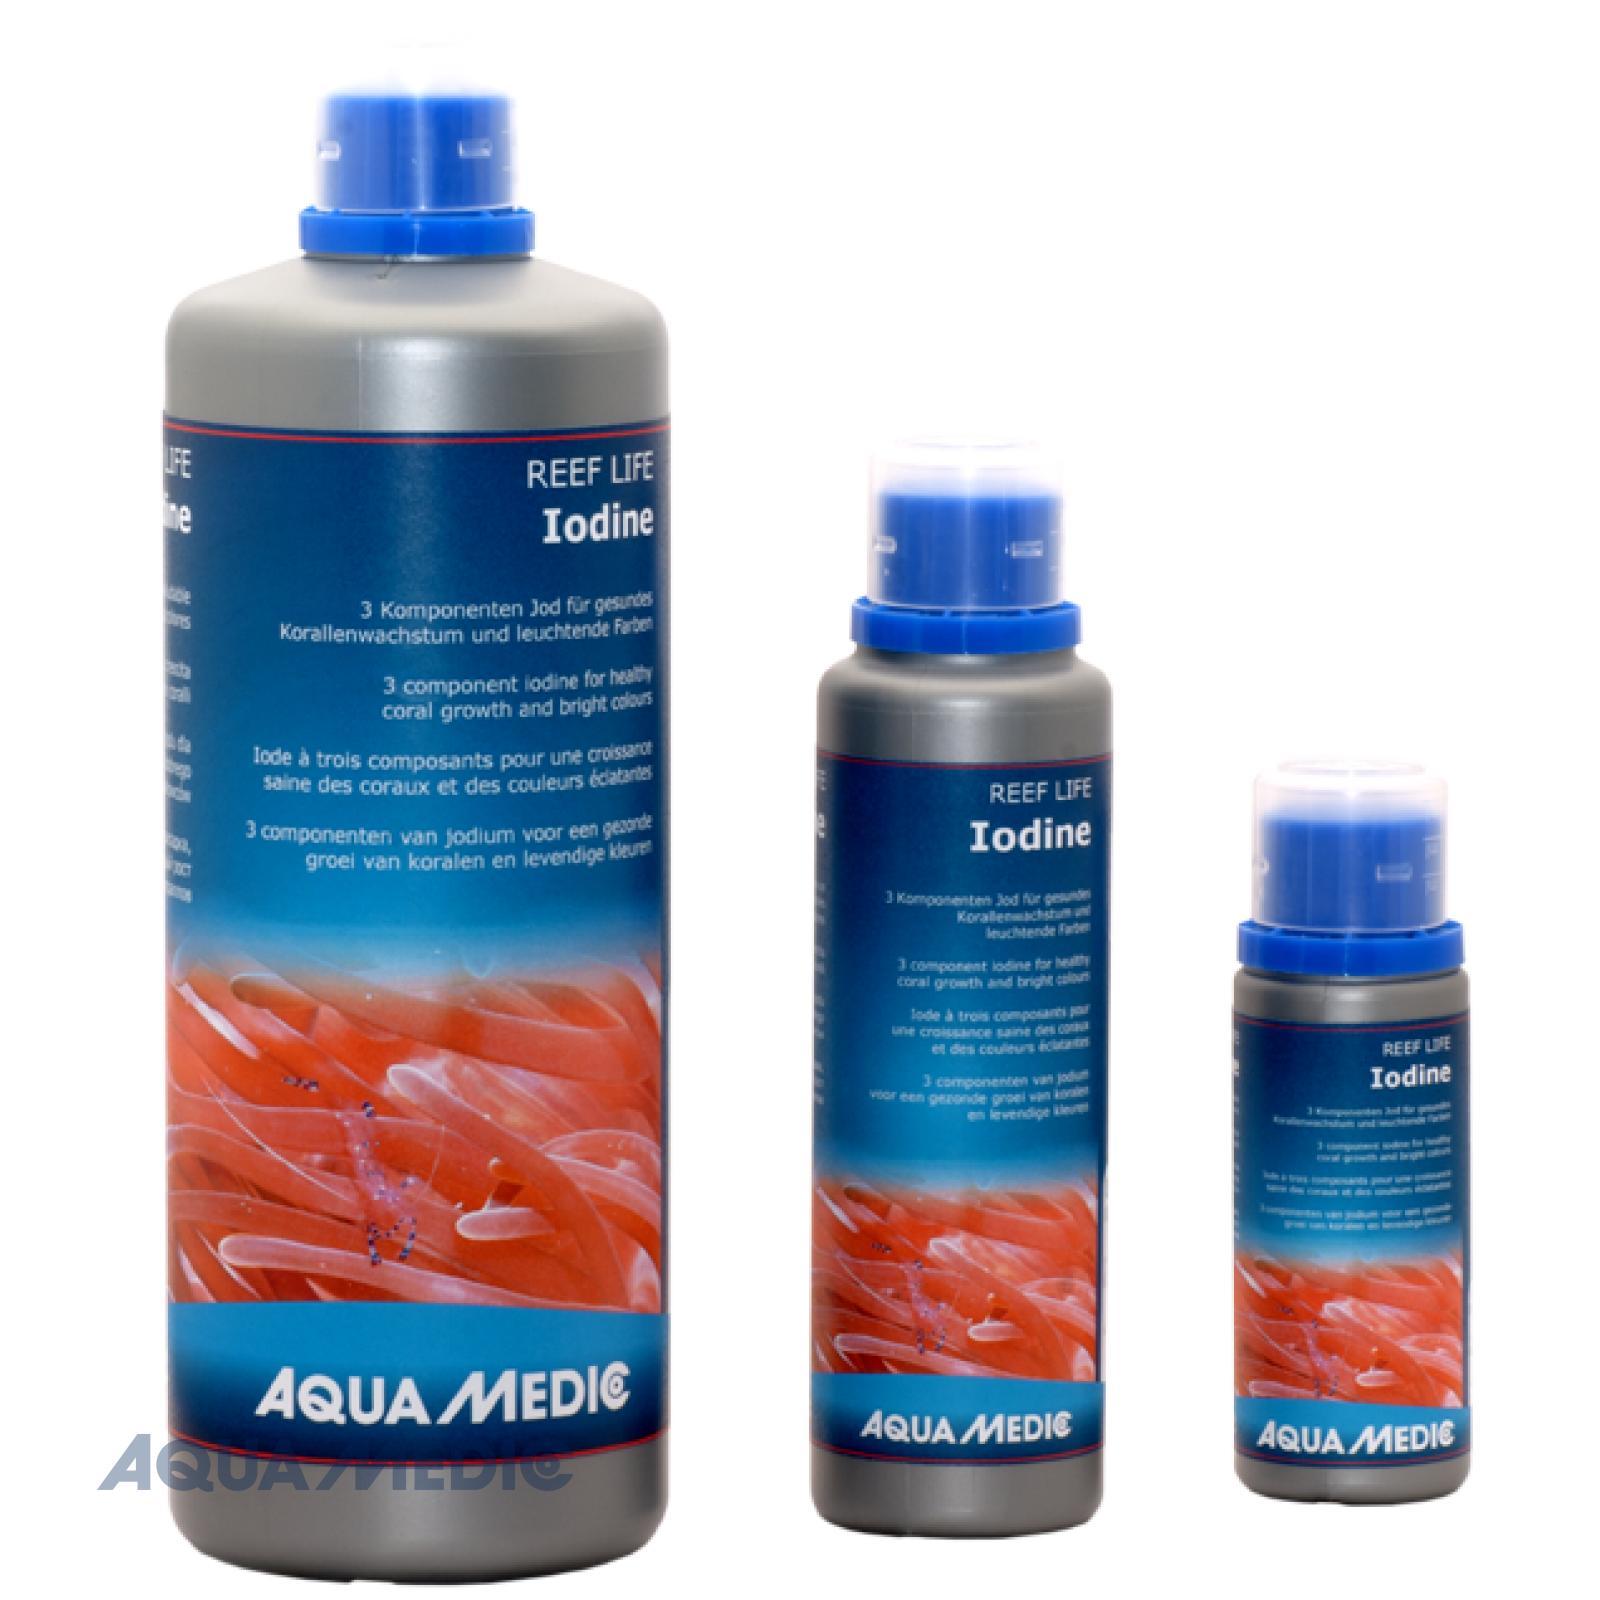 Aquamedic Reef Trace Iodine 100ml